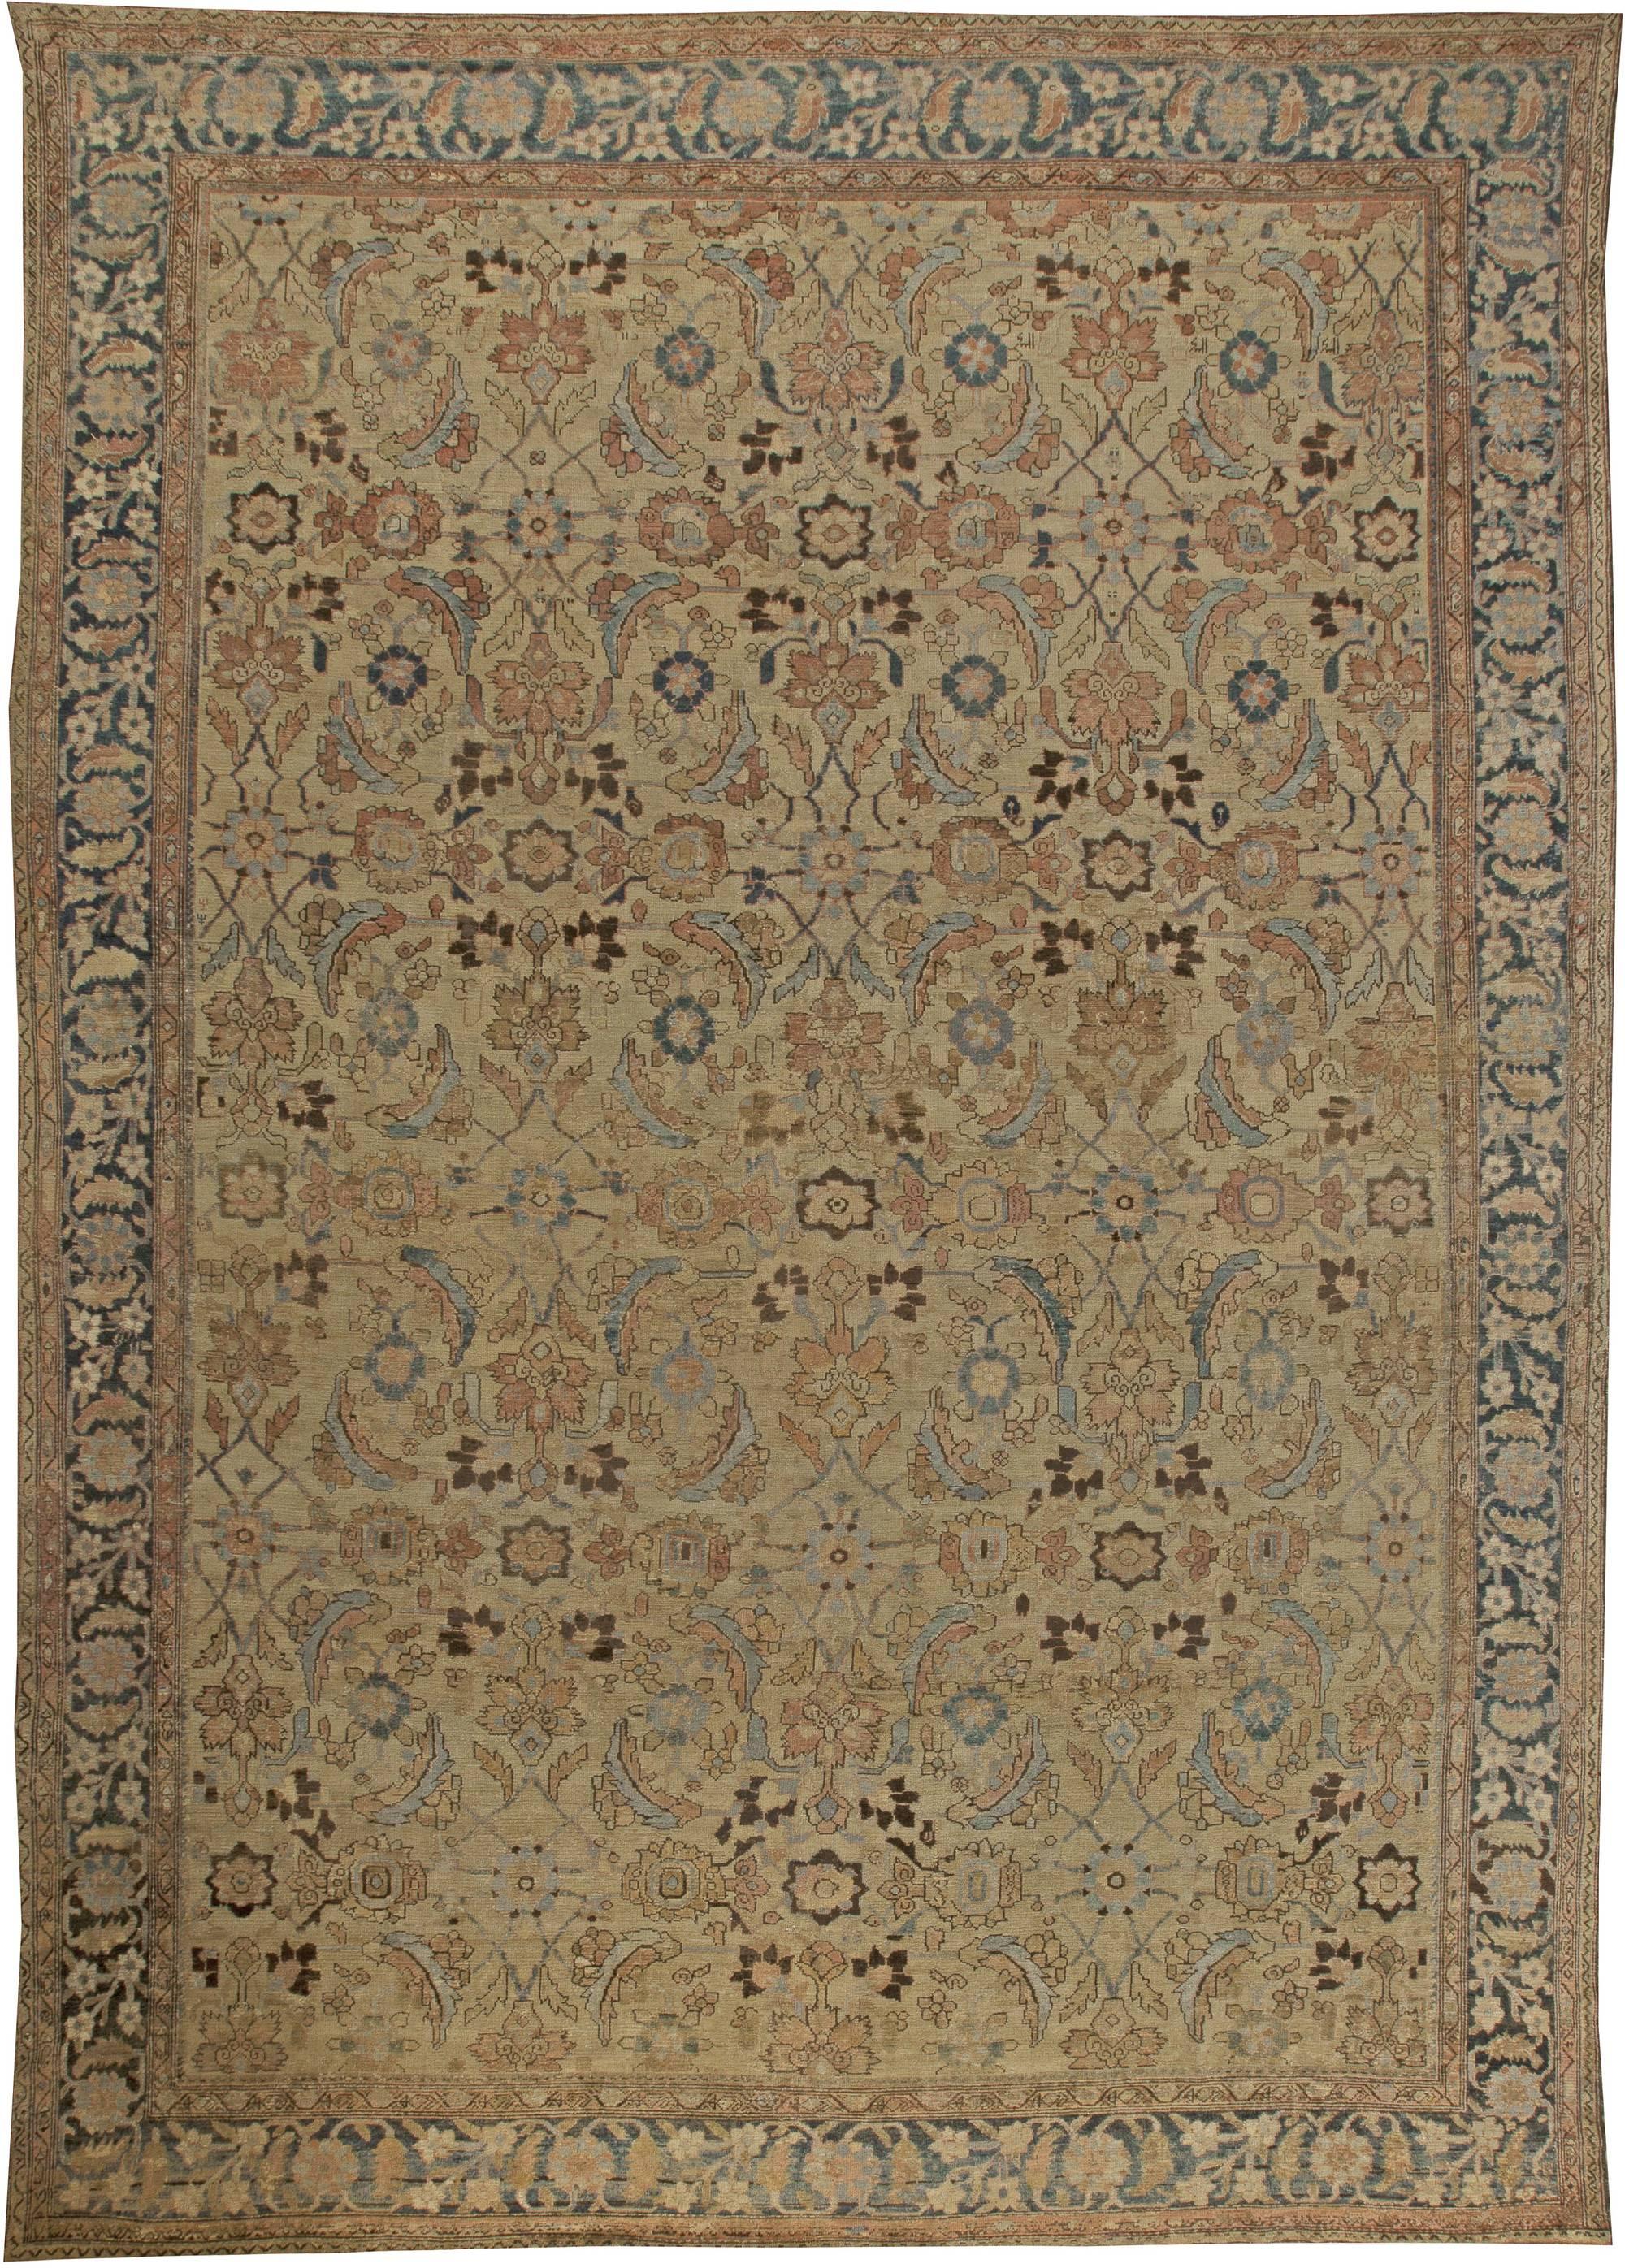 Antique Persian Malayer Rug Bb5996 By Doris Leslie Blau